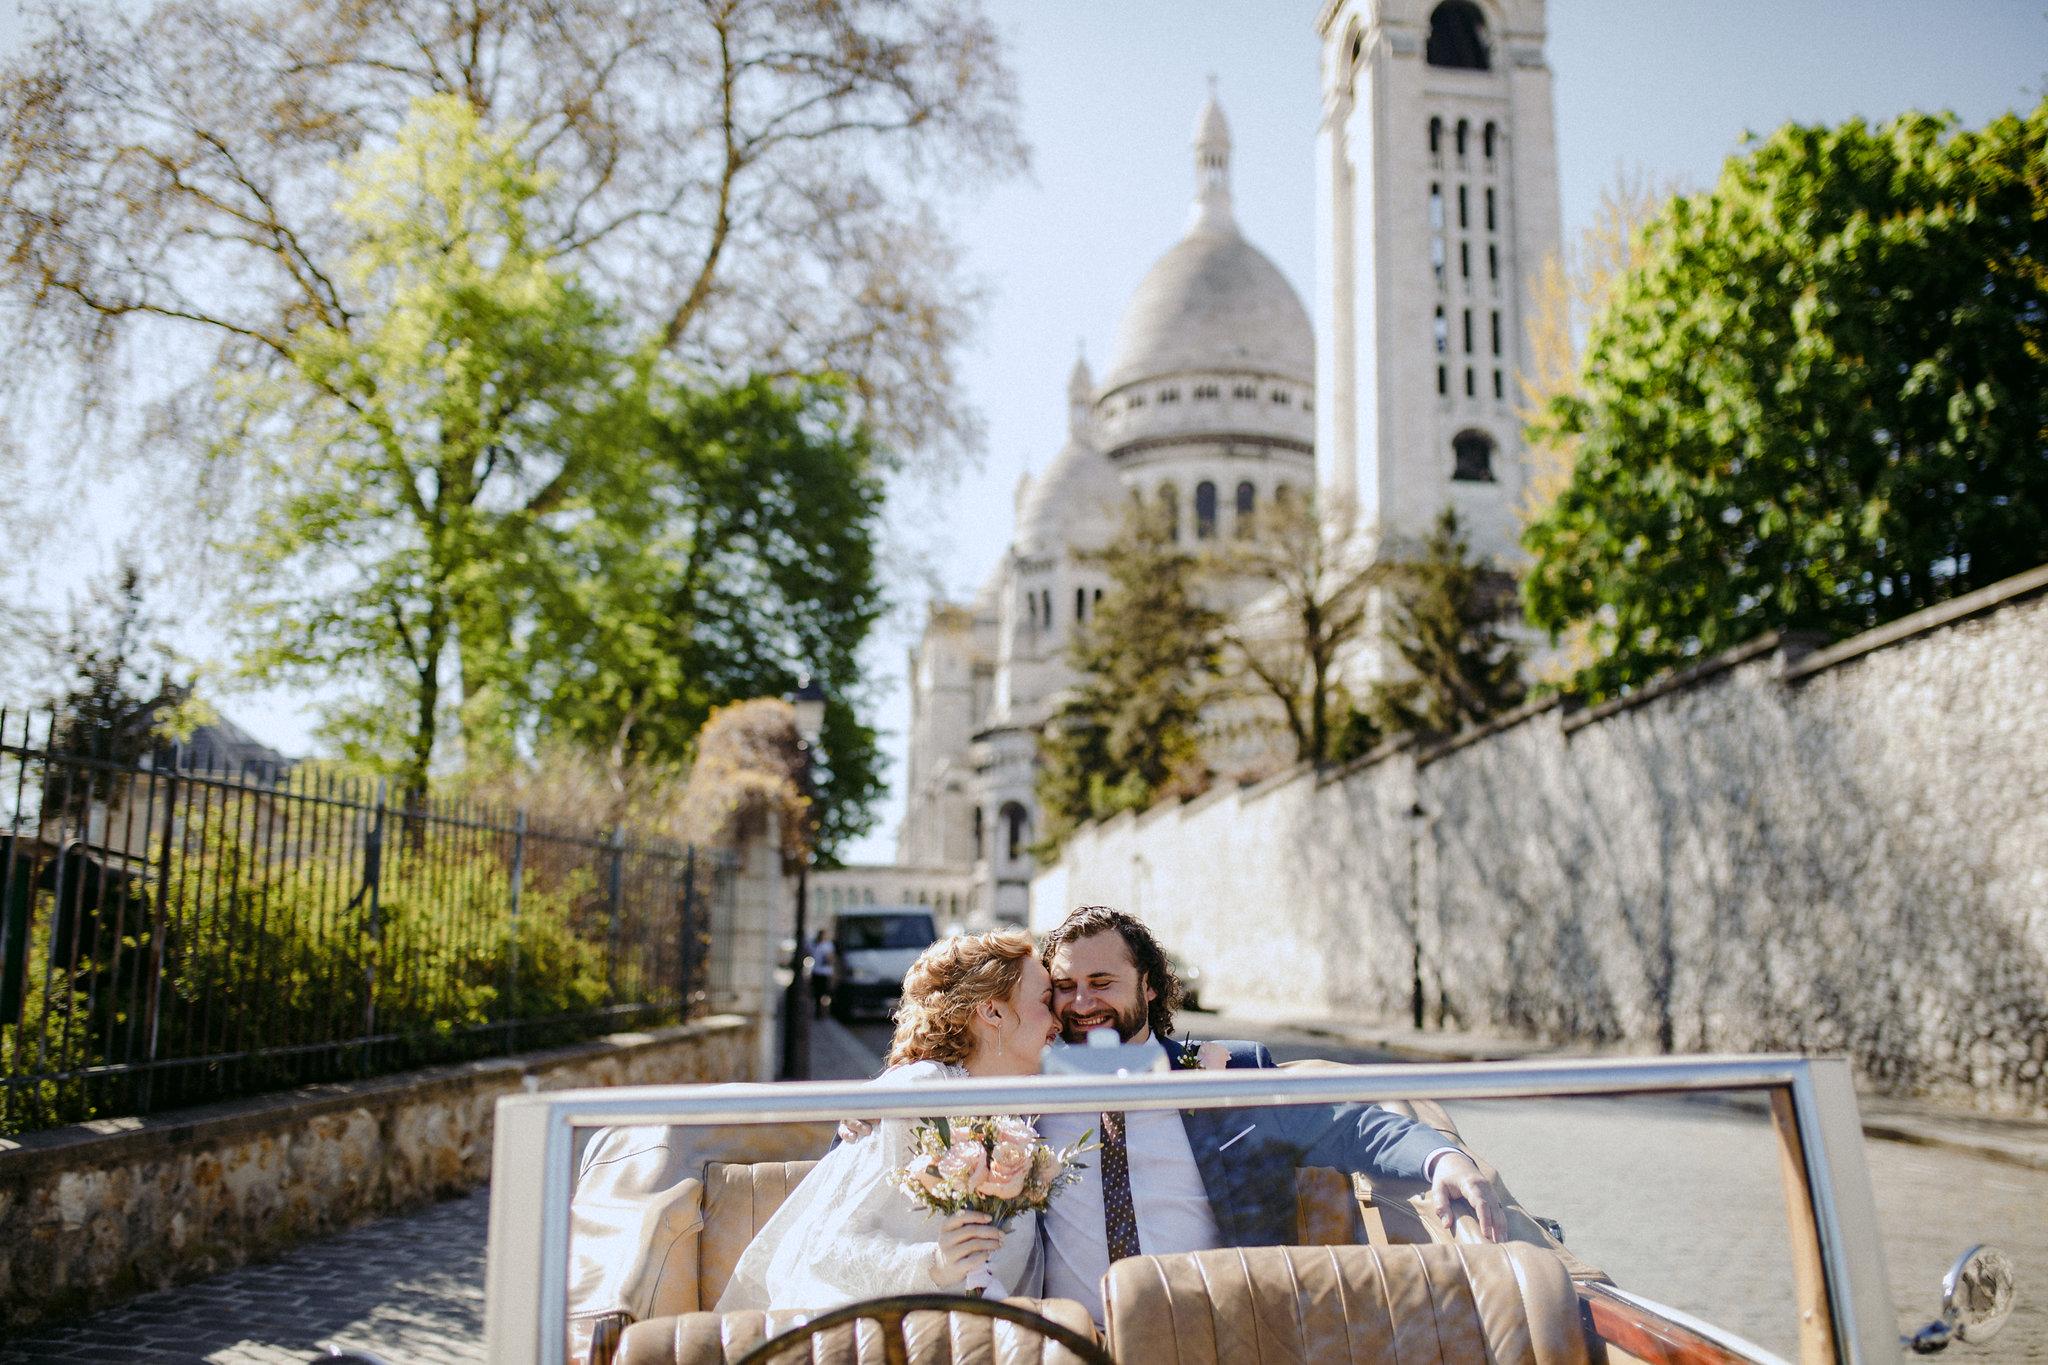 Paris_elopement_wedding_photographer-224.jpg